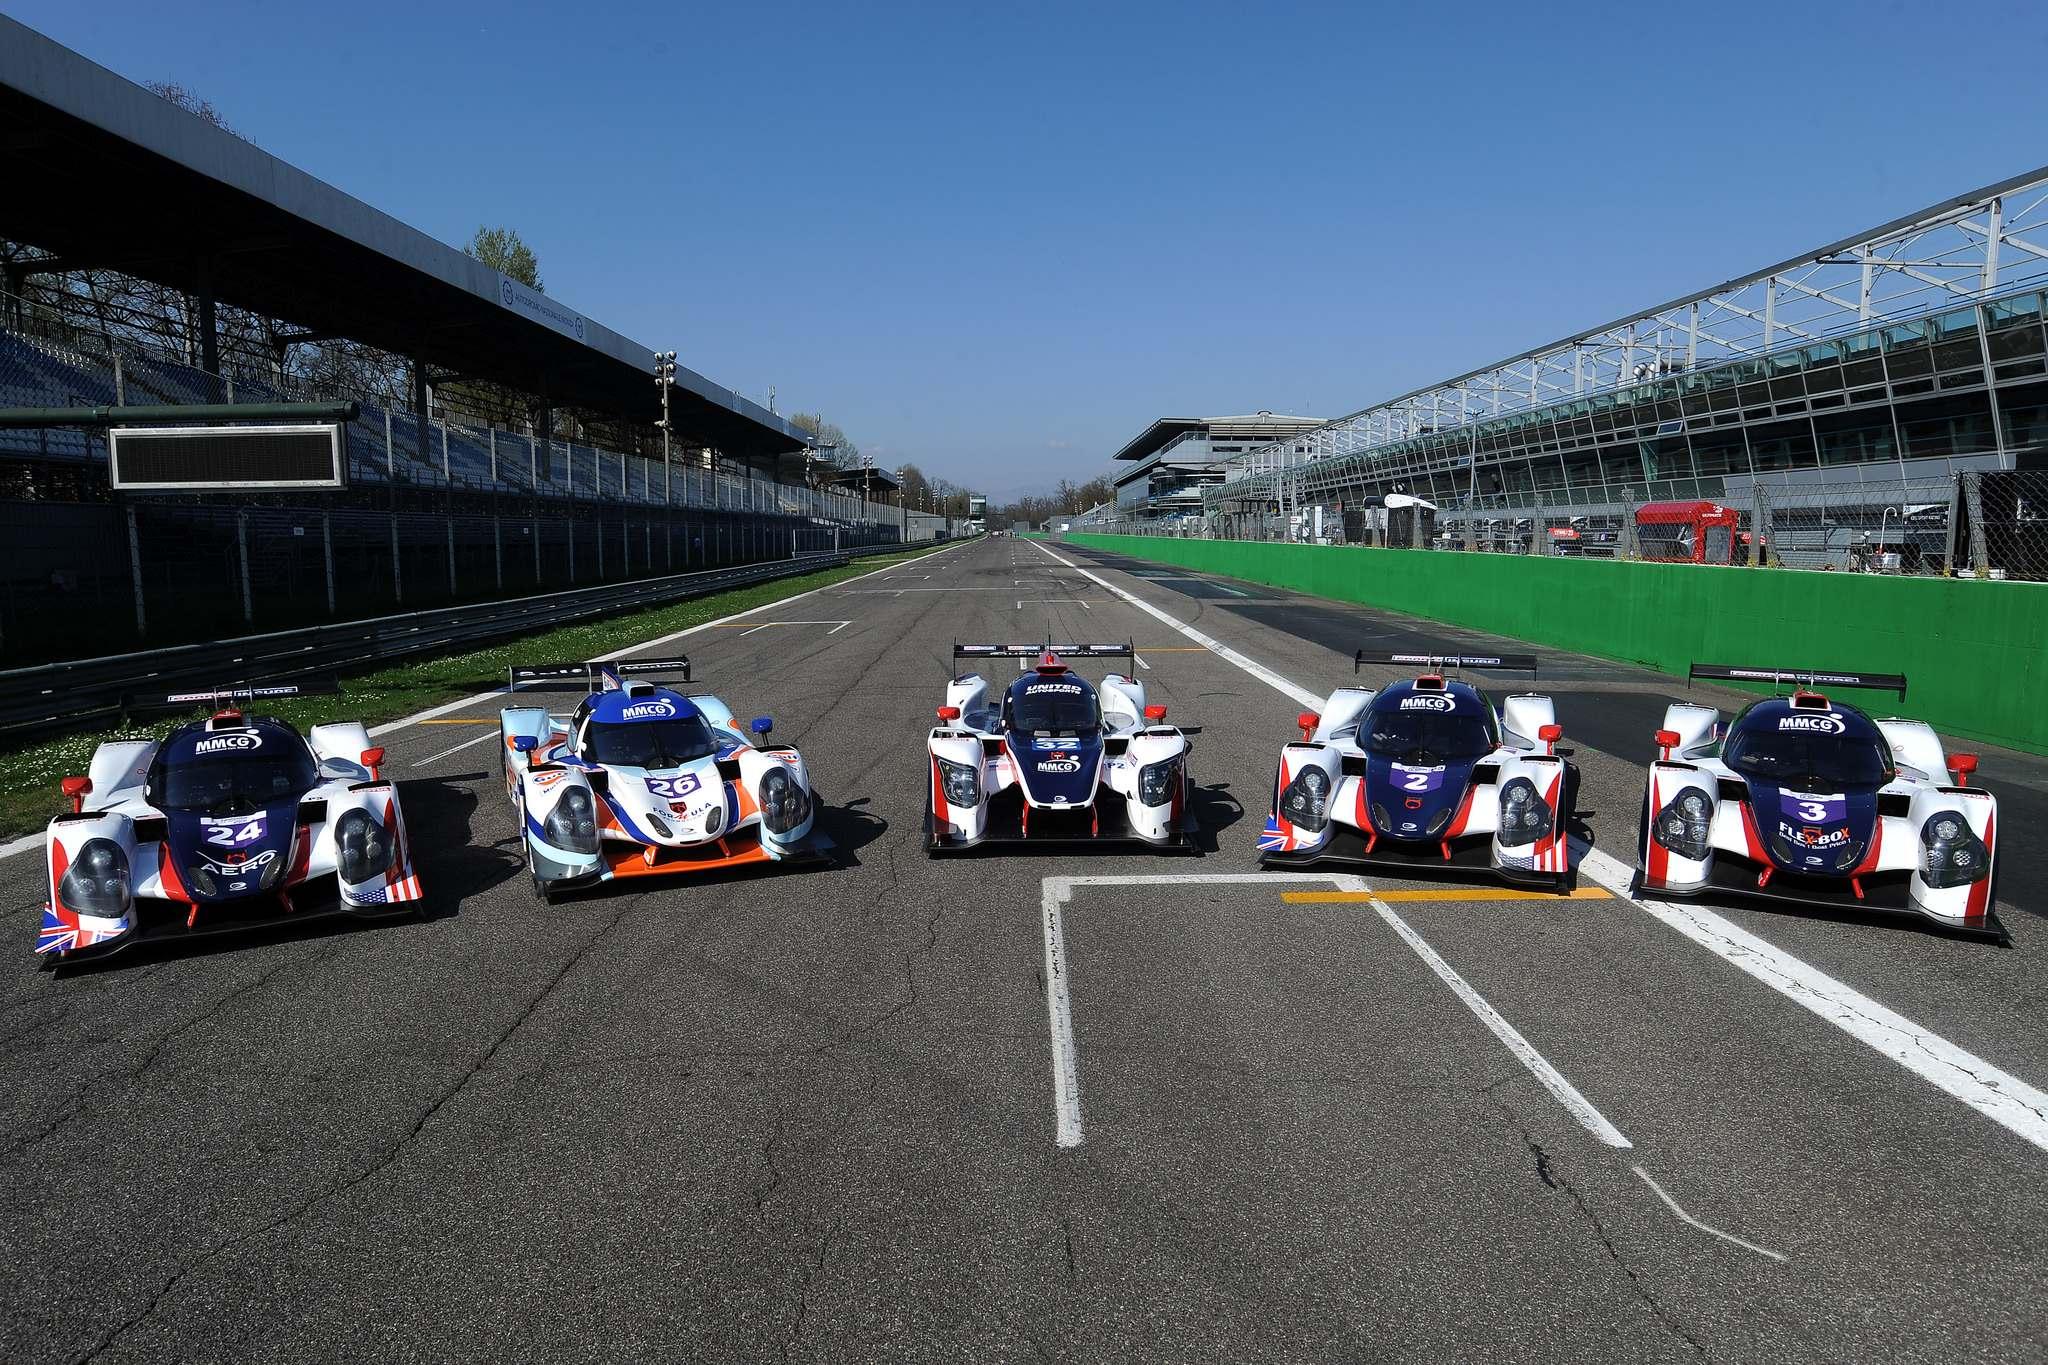 unitedautosports United Autosports in Monza